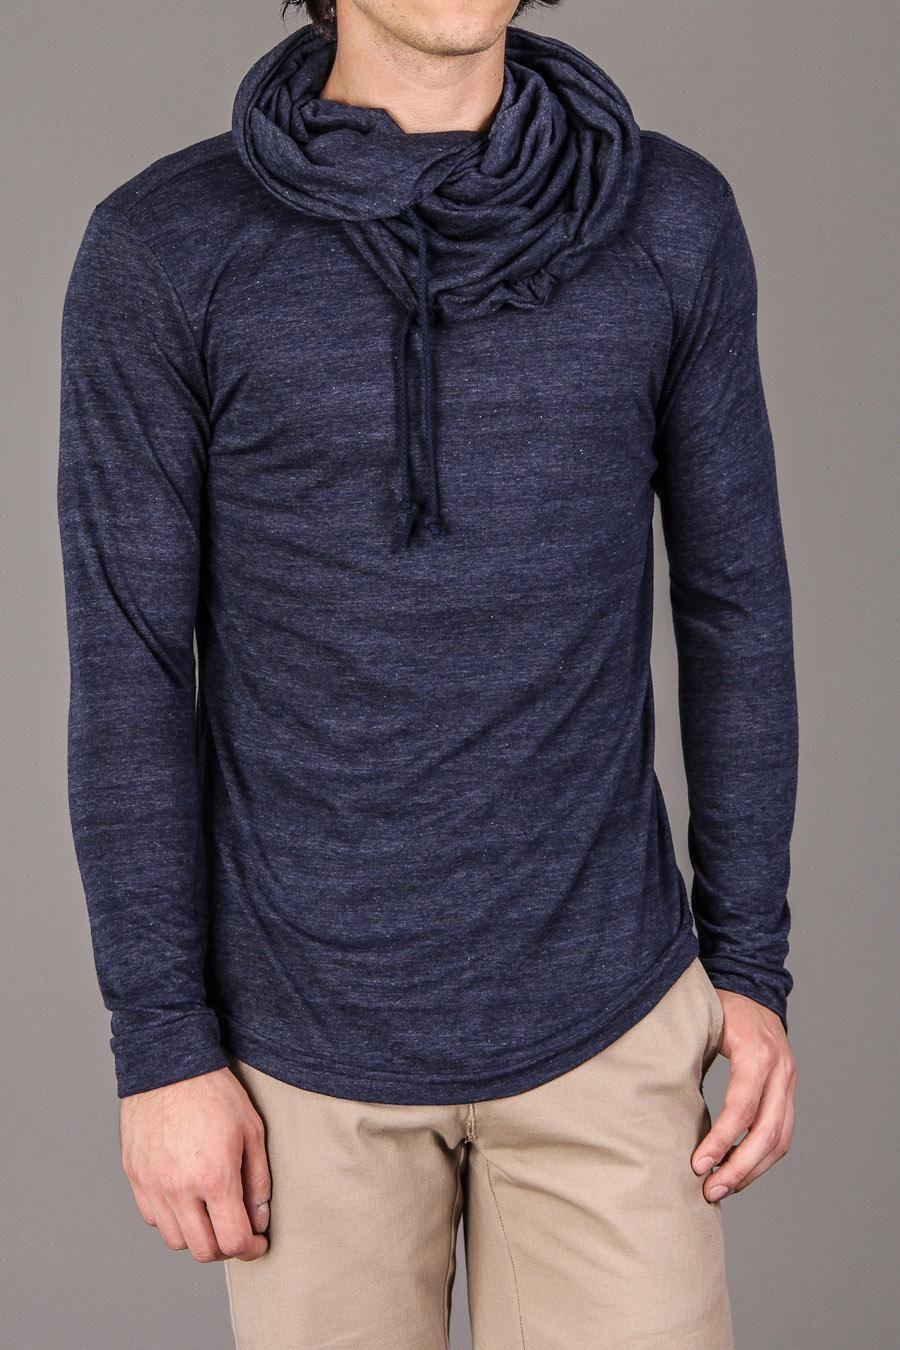 Lantern Cowl Collar Lightweight Sweater - Arsnl - Sweaters ...